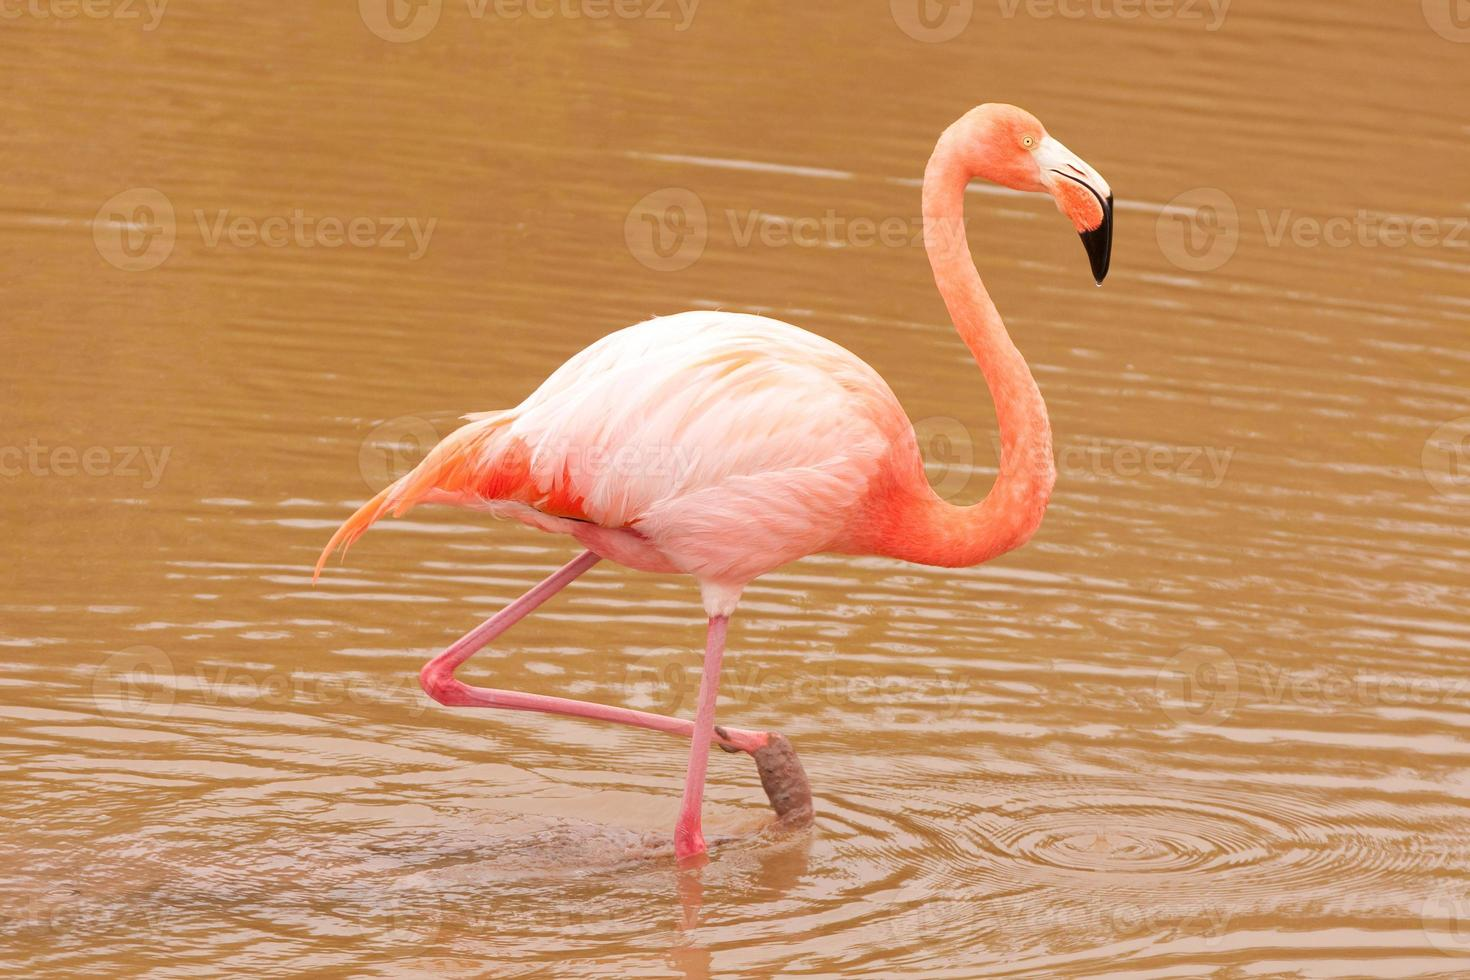 Pink Flamingo (Phoenicopterus ruber) photo